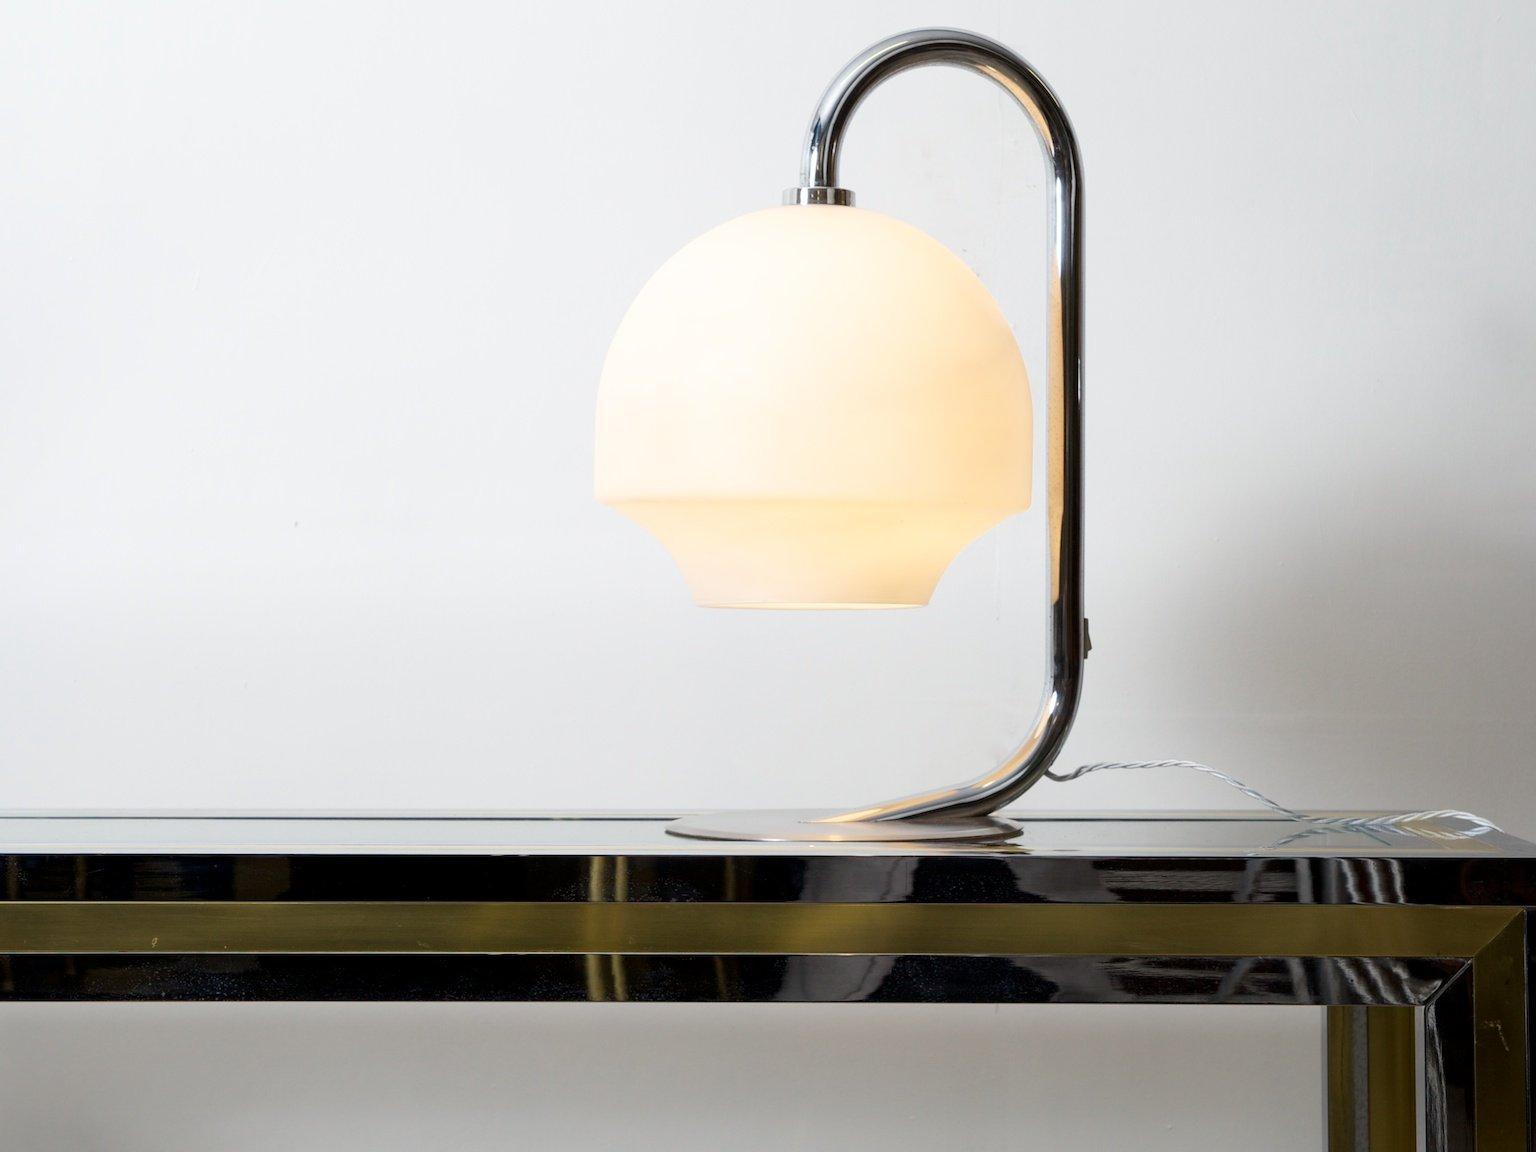 lampe opaline lampe de table opaline italie s en vente. Black Bedroom Furniture Sets. Home Design Ideas